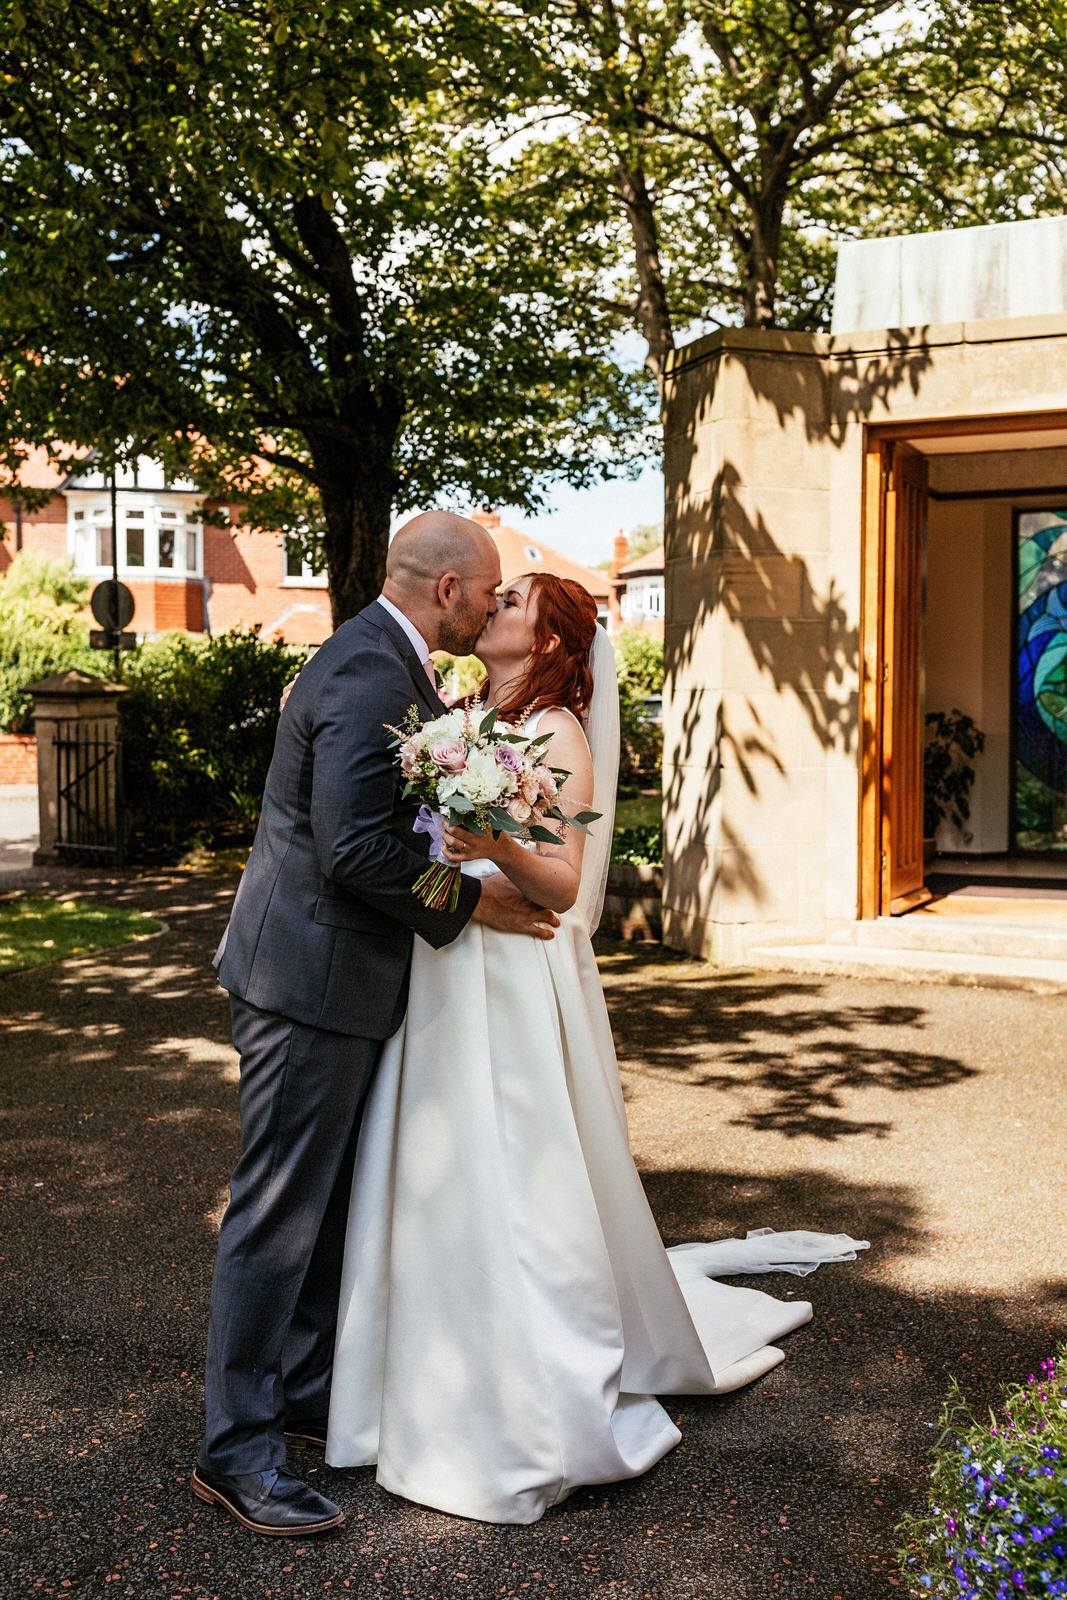 Beamish-Hall-Wedding-Photographer-018.jpg